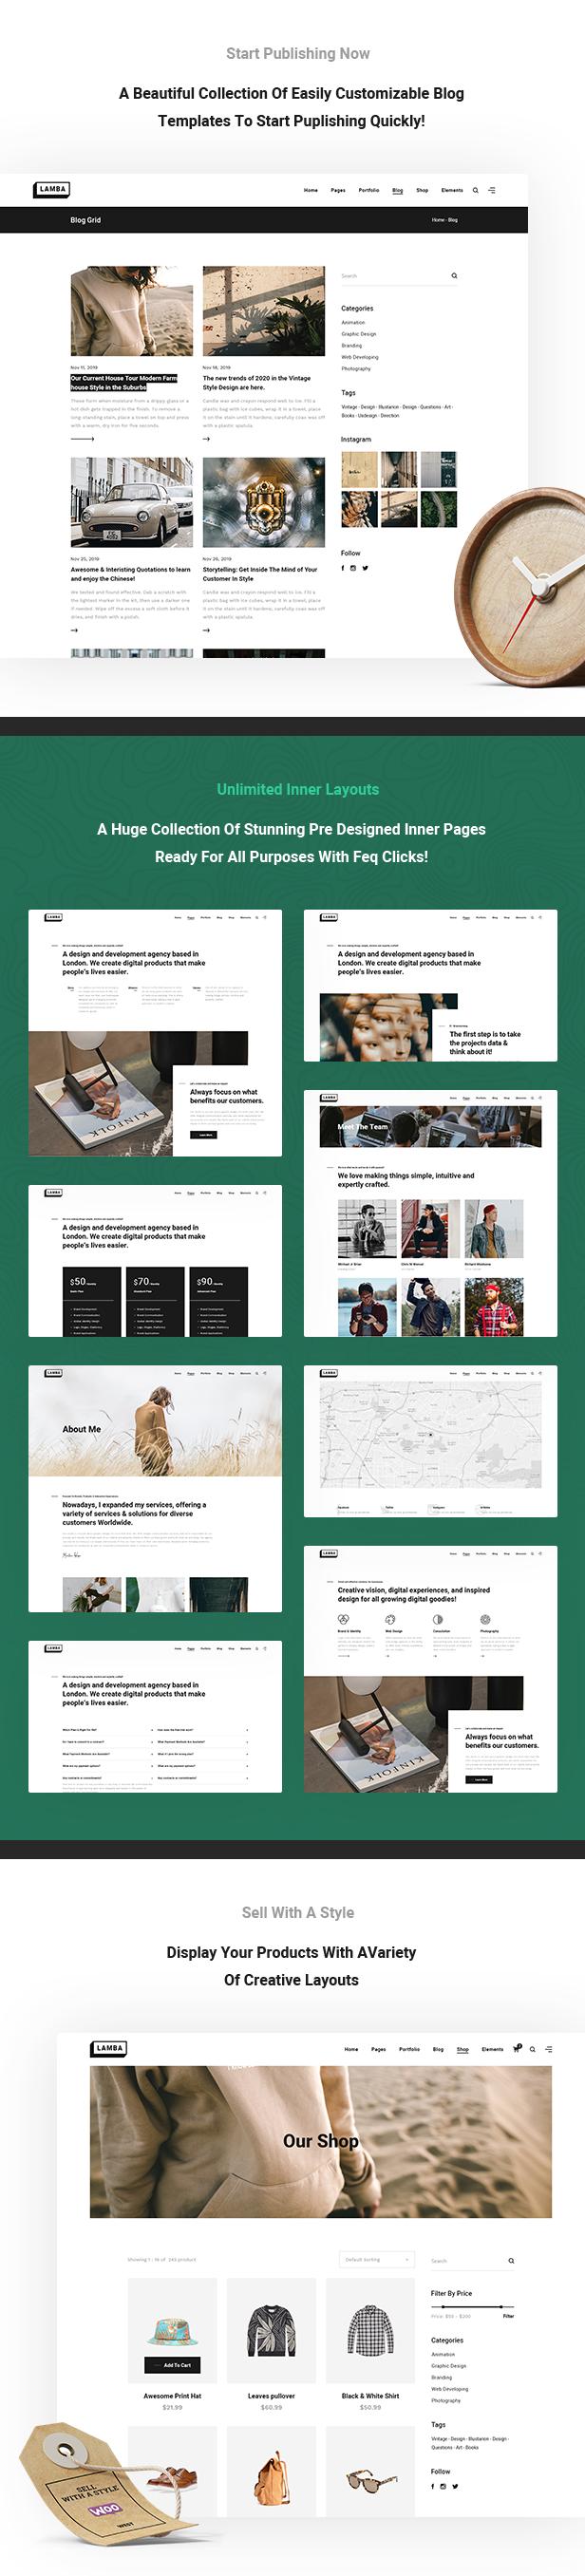 Lamba - Creative Portfolio & Agency HTML5 Template - 6